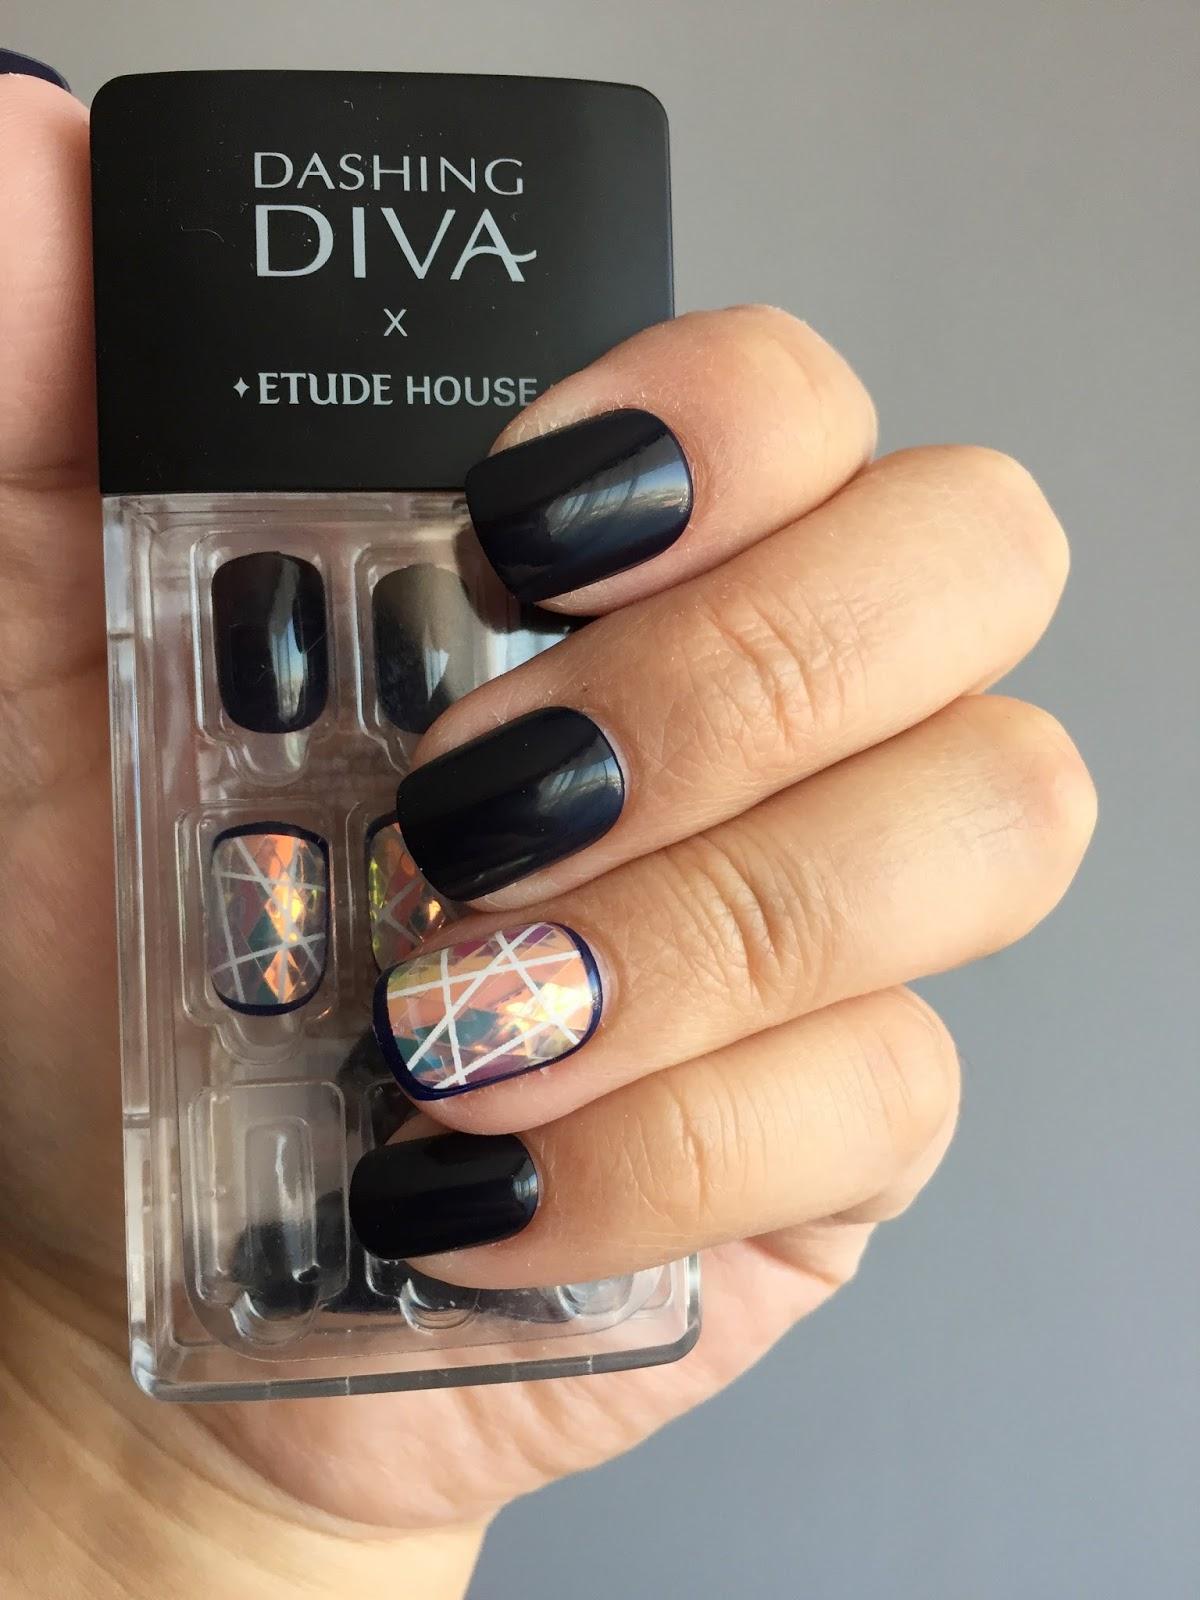 Diva Nail Design Aberystwyth Prices